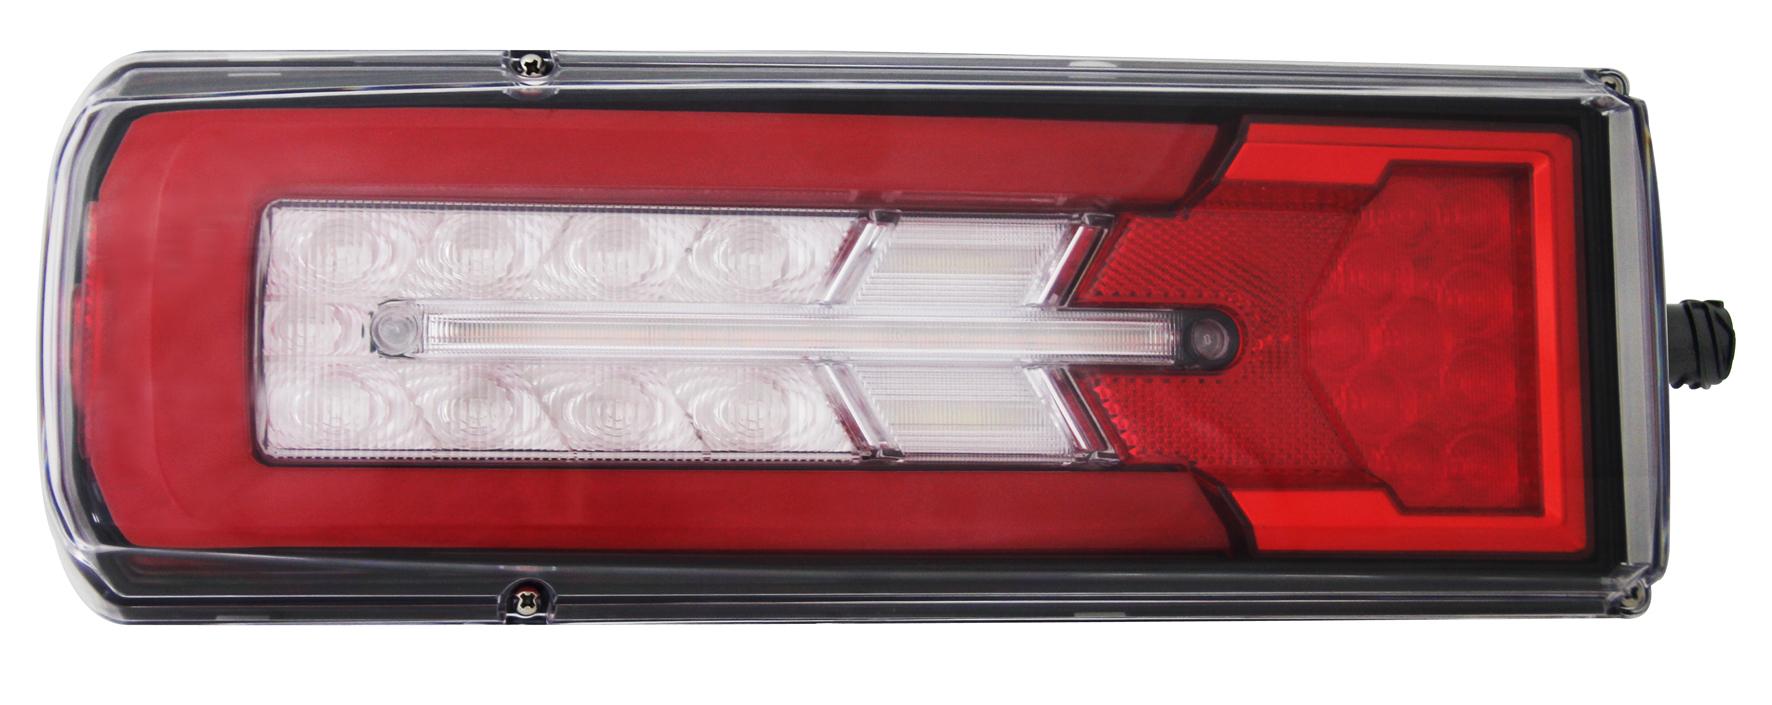 Lucidity 26075 LED Aurora Arrow Full Function Rear Lamp